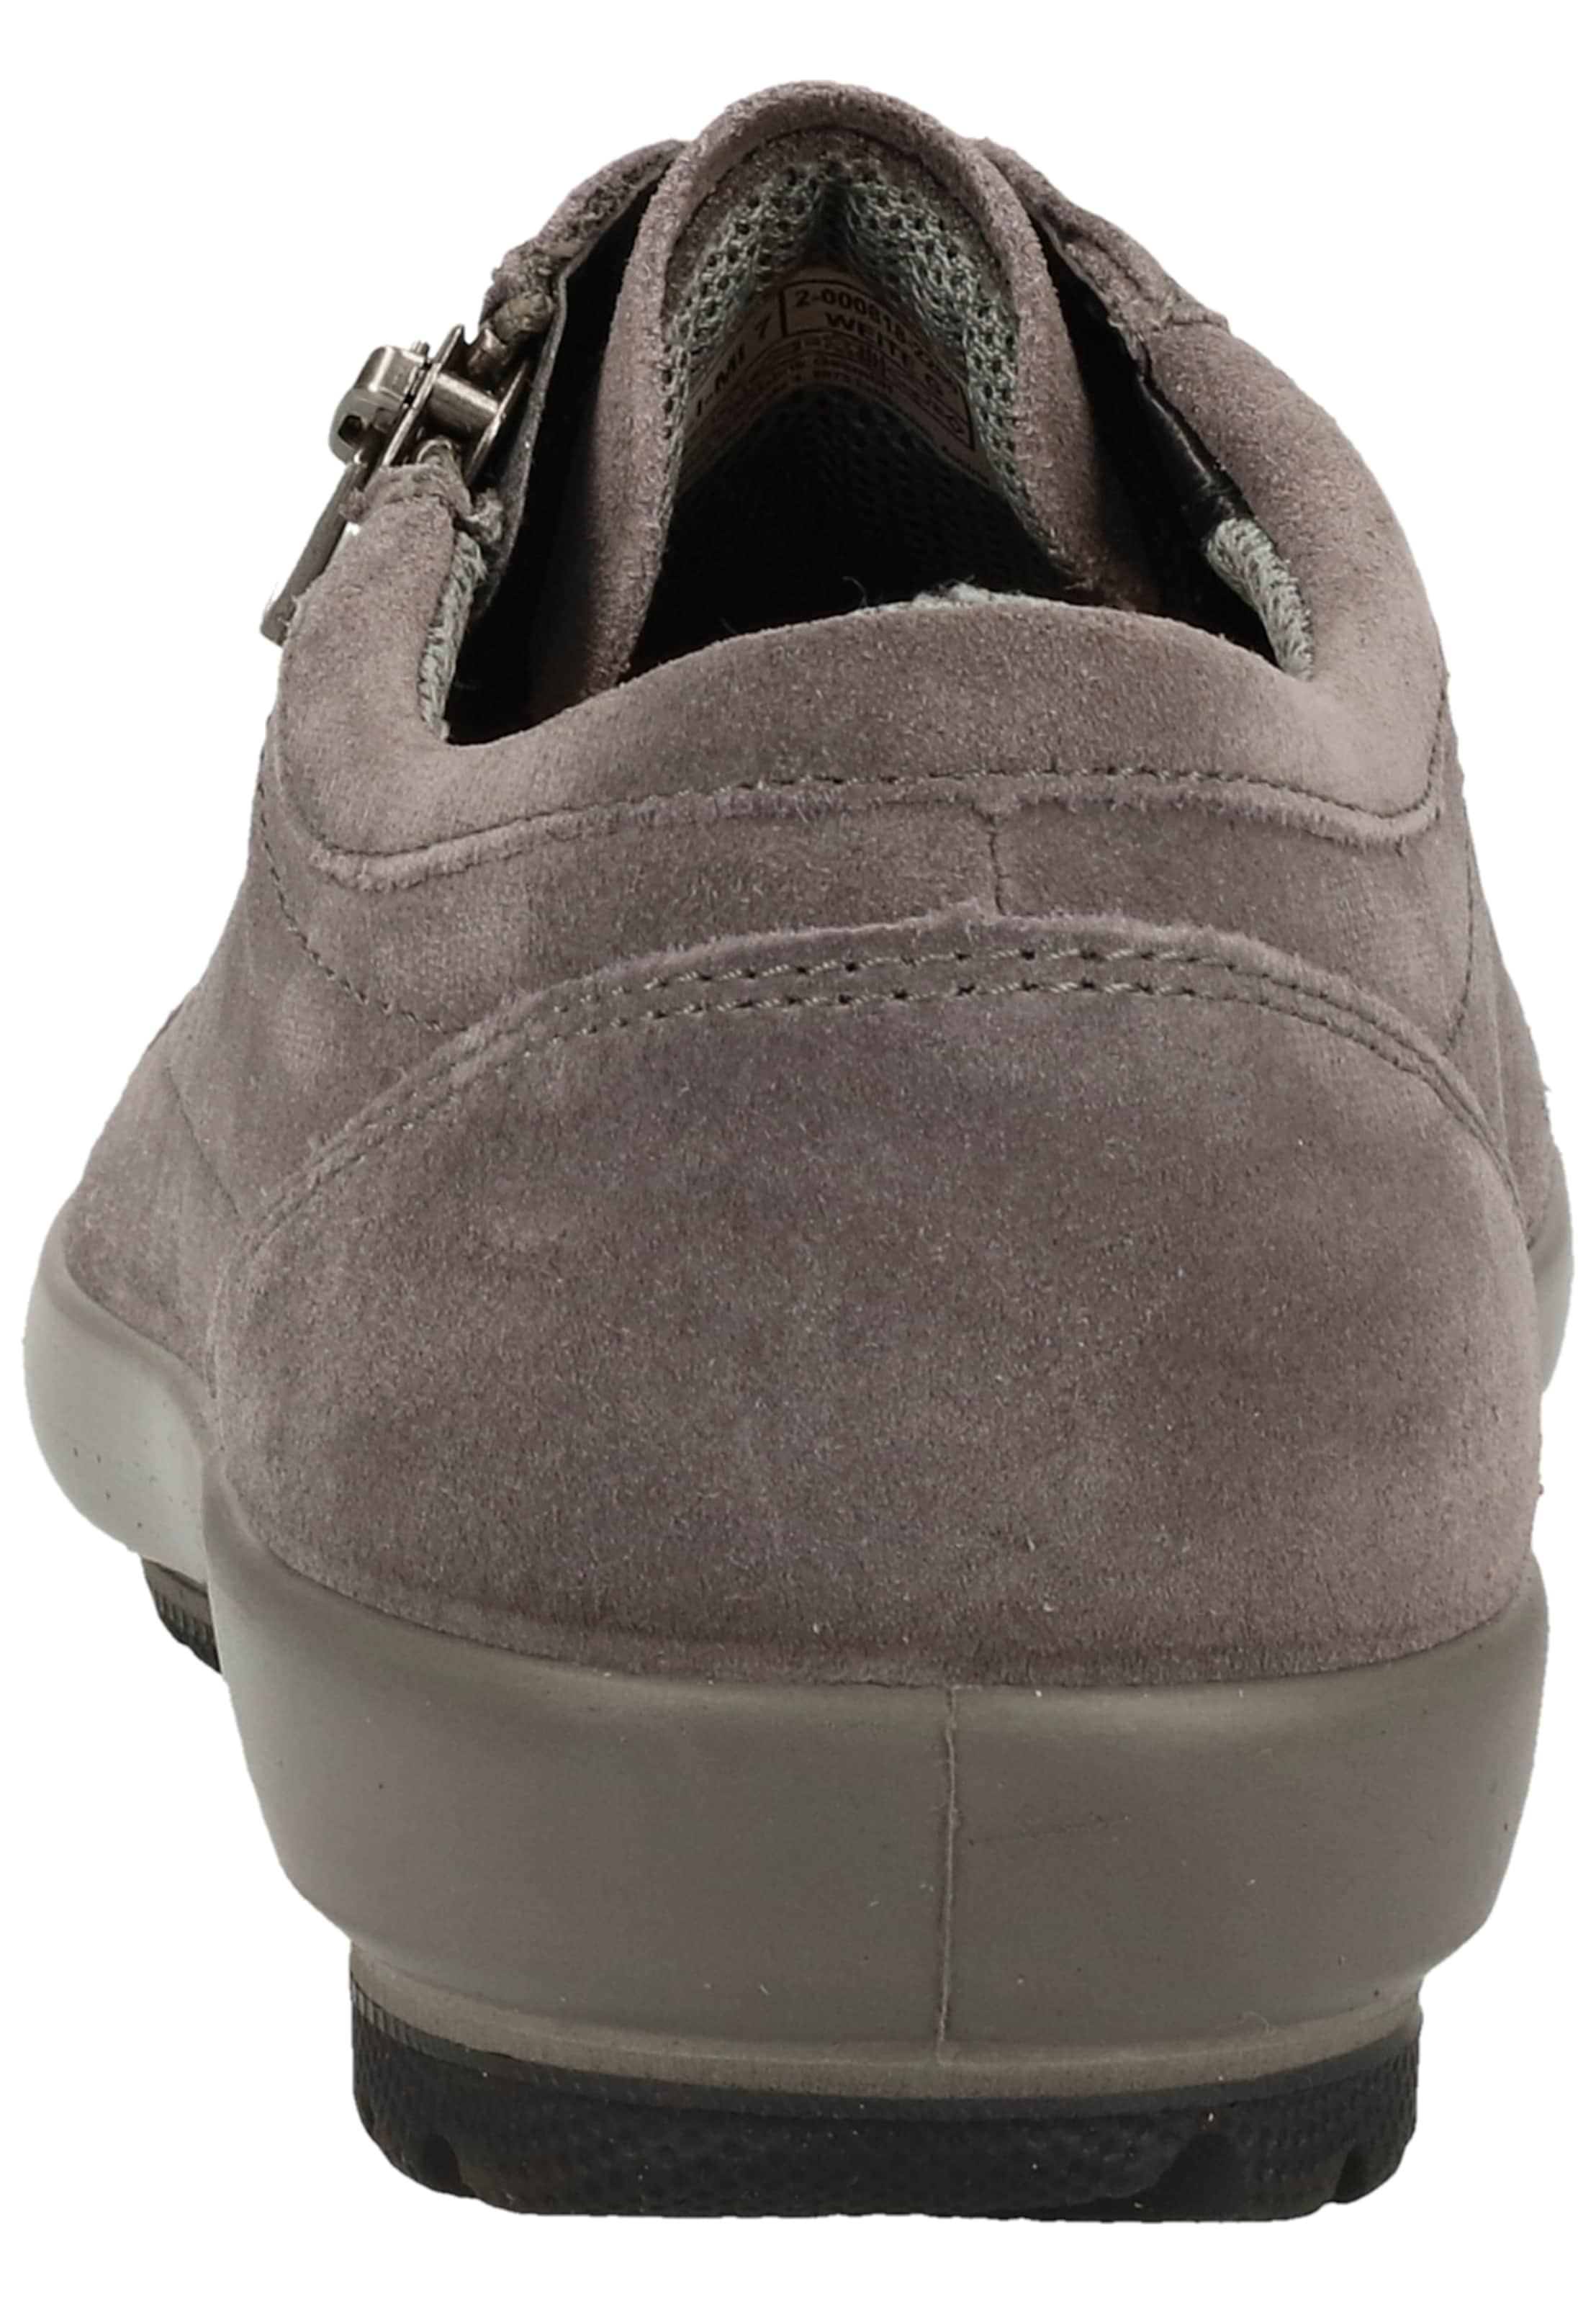 Legero Sneaker in taupe